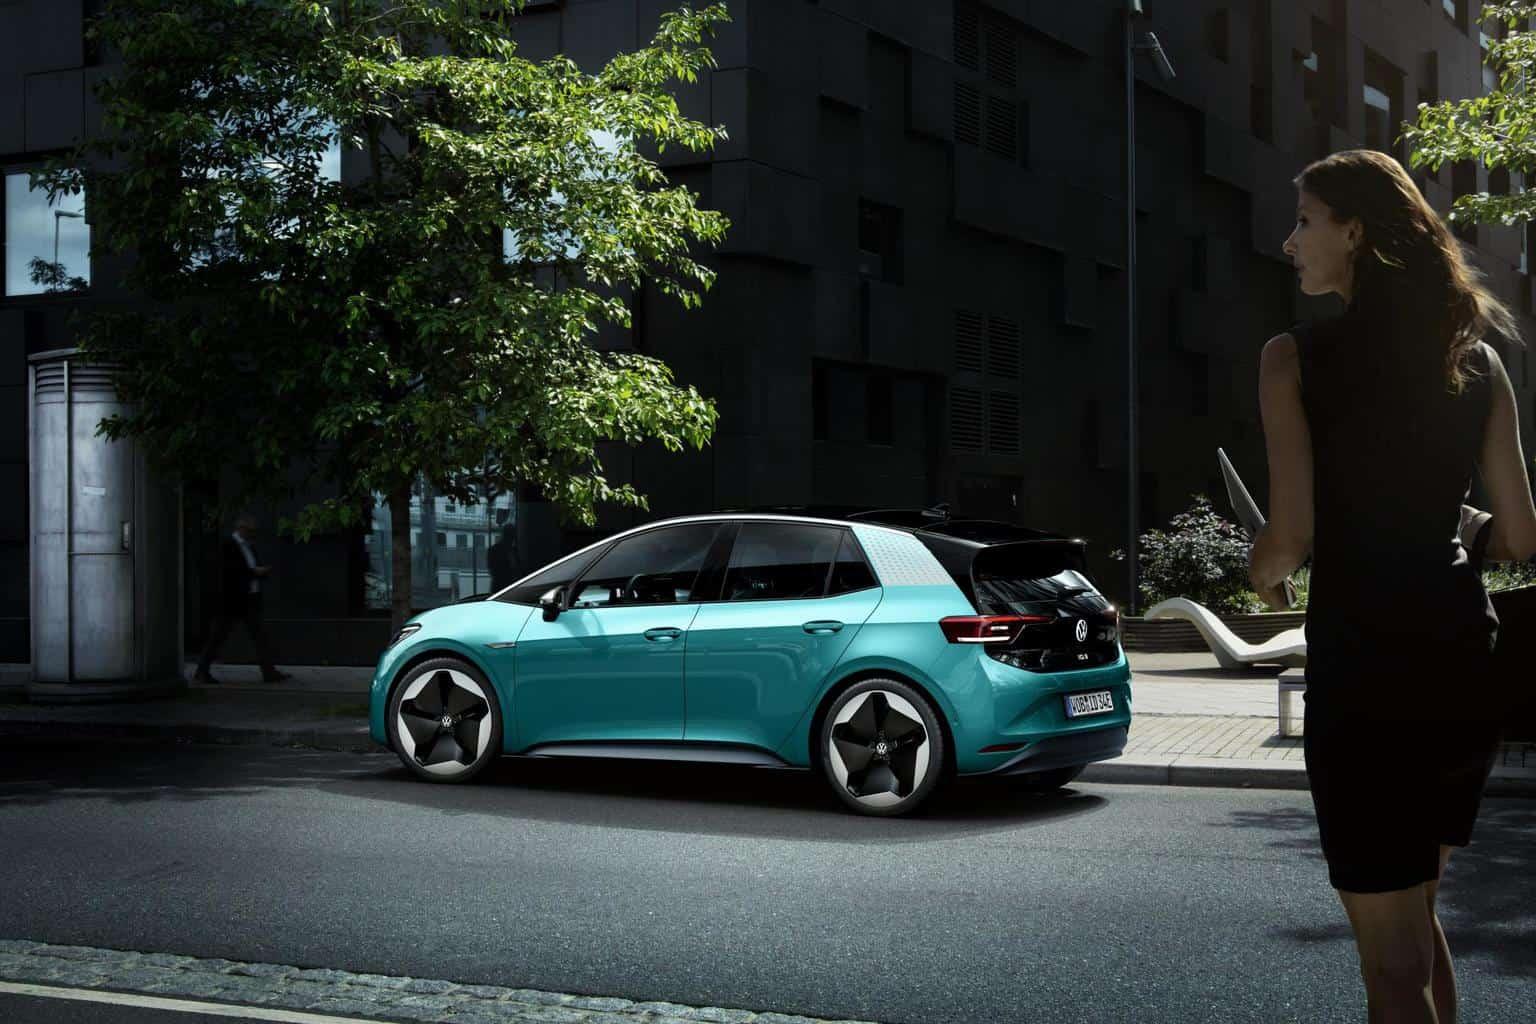 """Wie geplant im Sommer"": VW hält trotz massiver Software-Probleme an ID.3-Start fest"